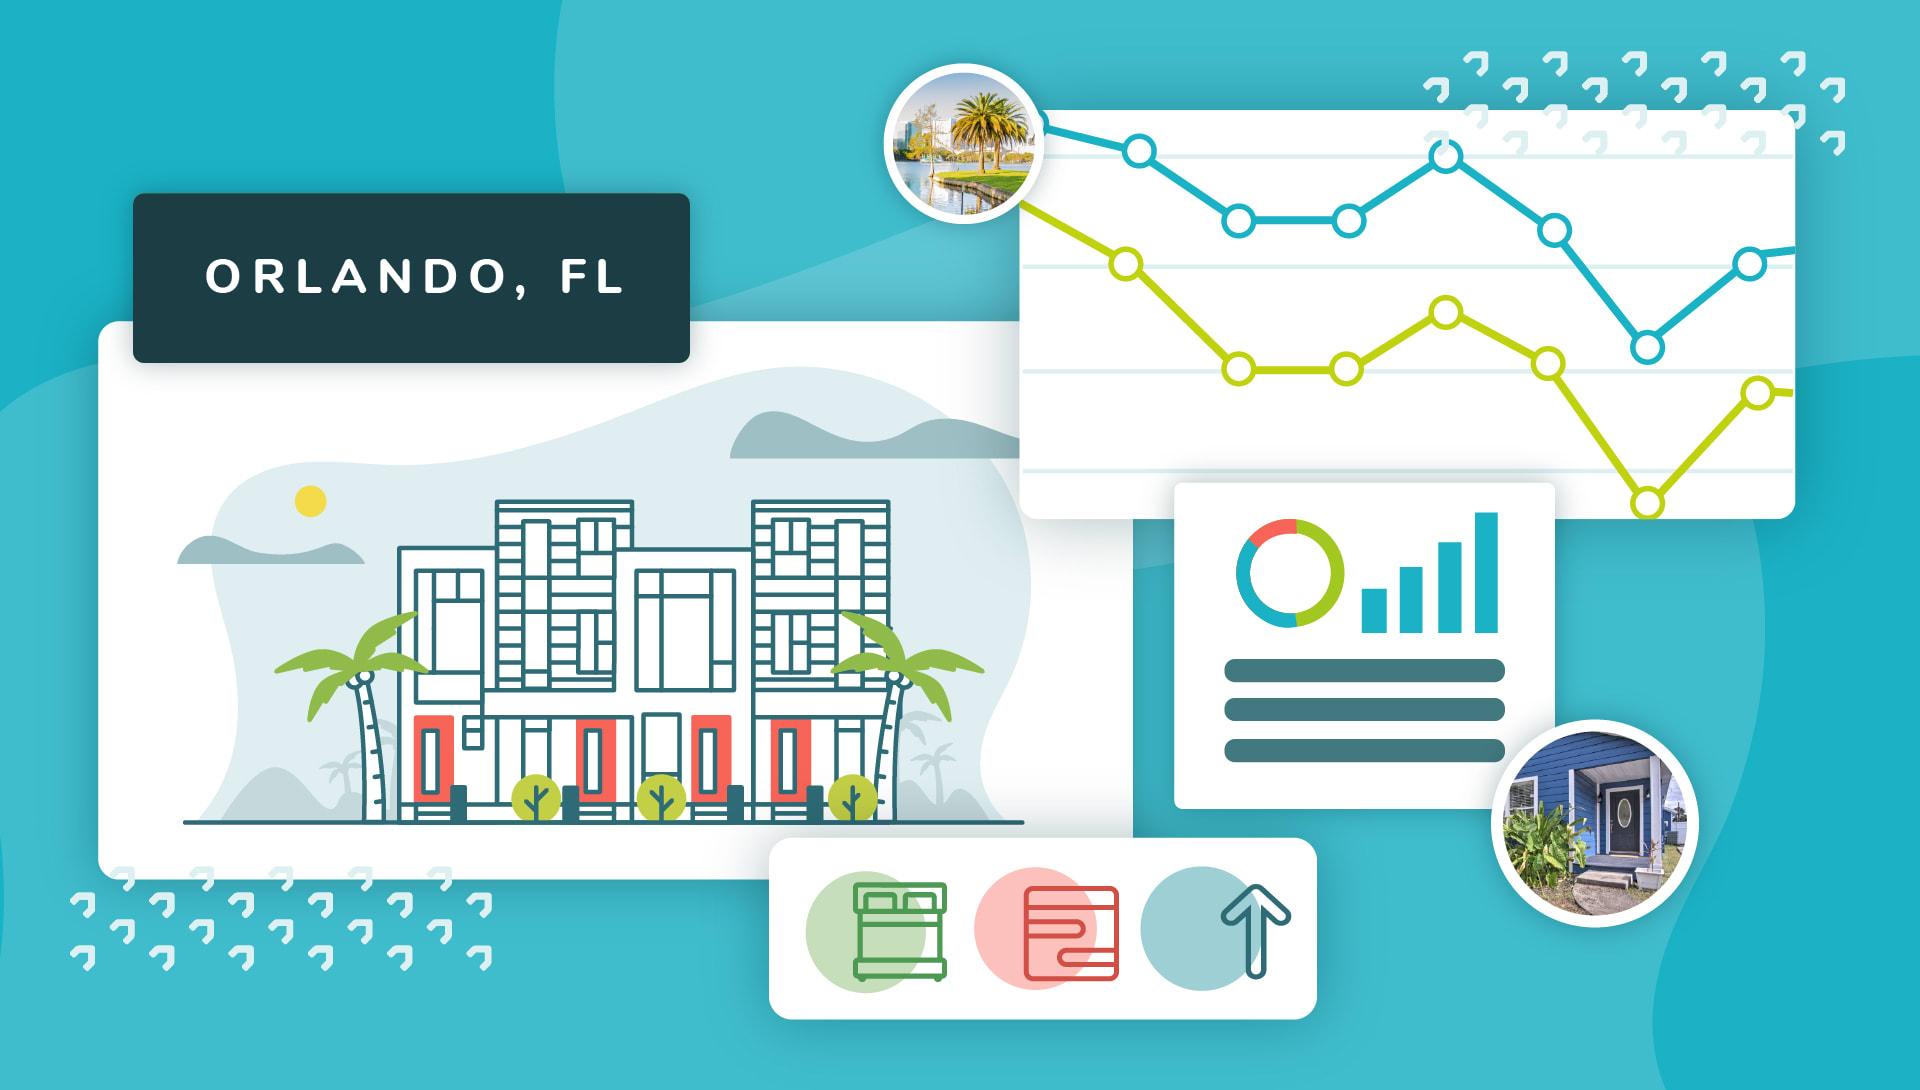 Vacation Rental Market Analysis: Orlando, Kissimmee, & Davenport, FL